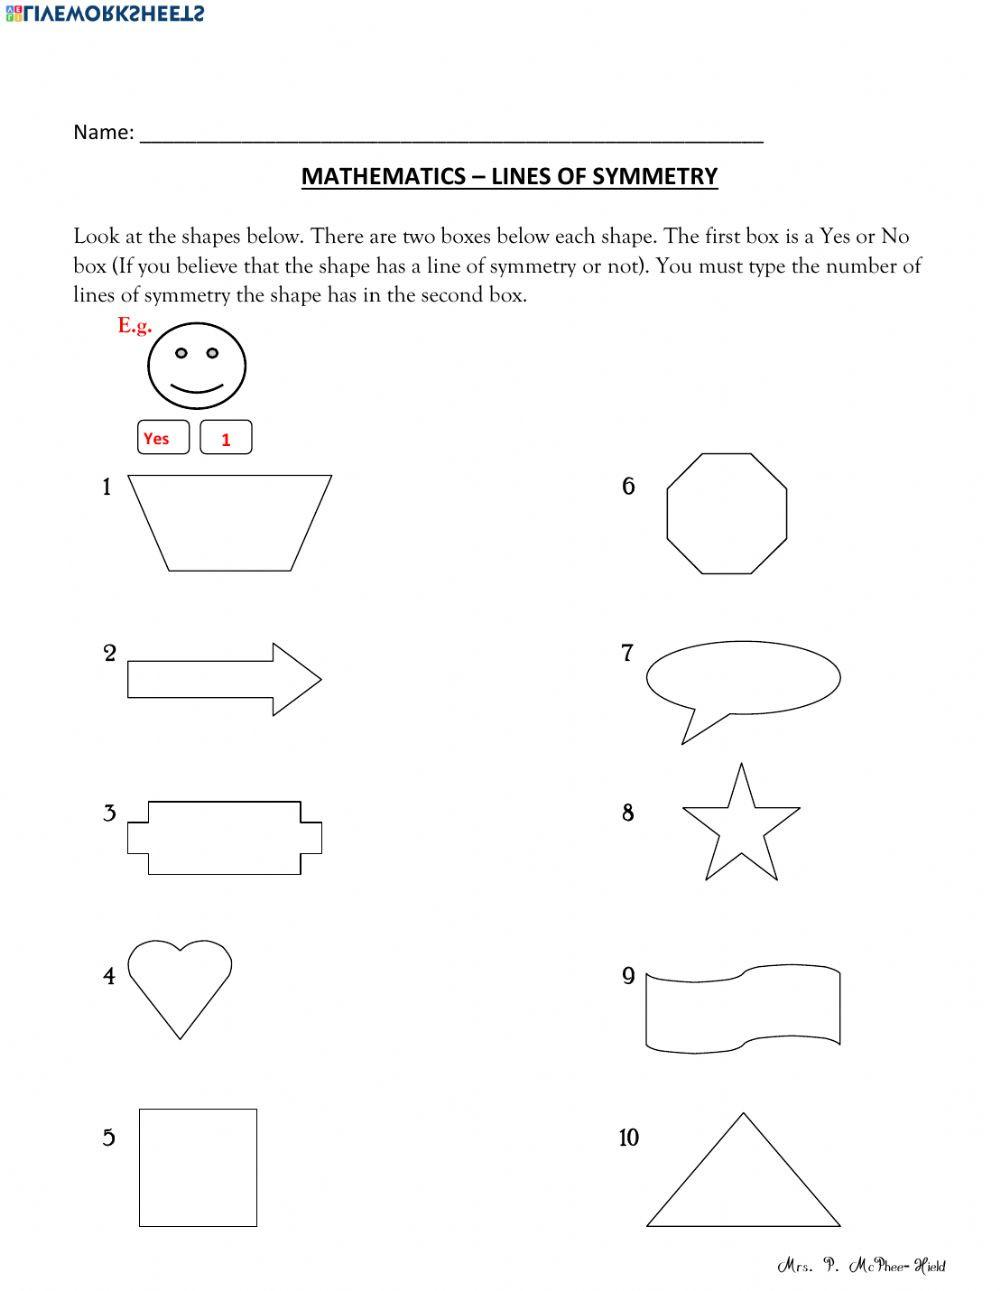 Line Of Symmetry Worksheet Find the Lines Of Symmetry Interactive Worksheet